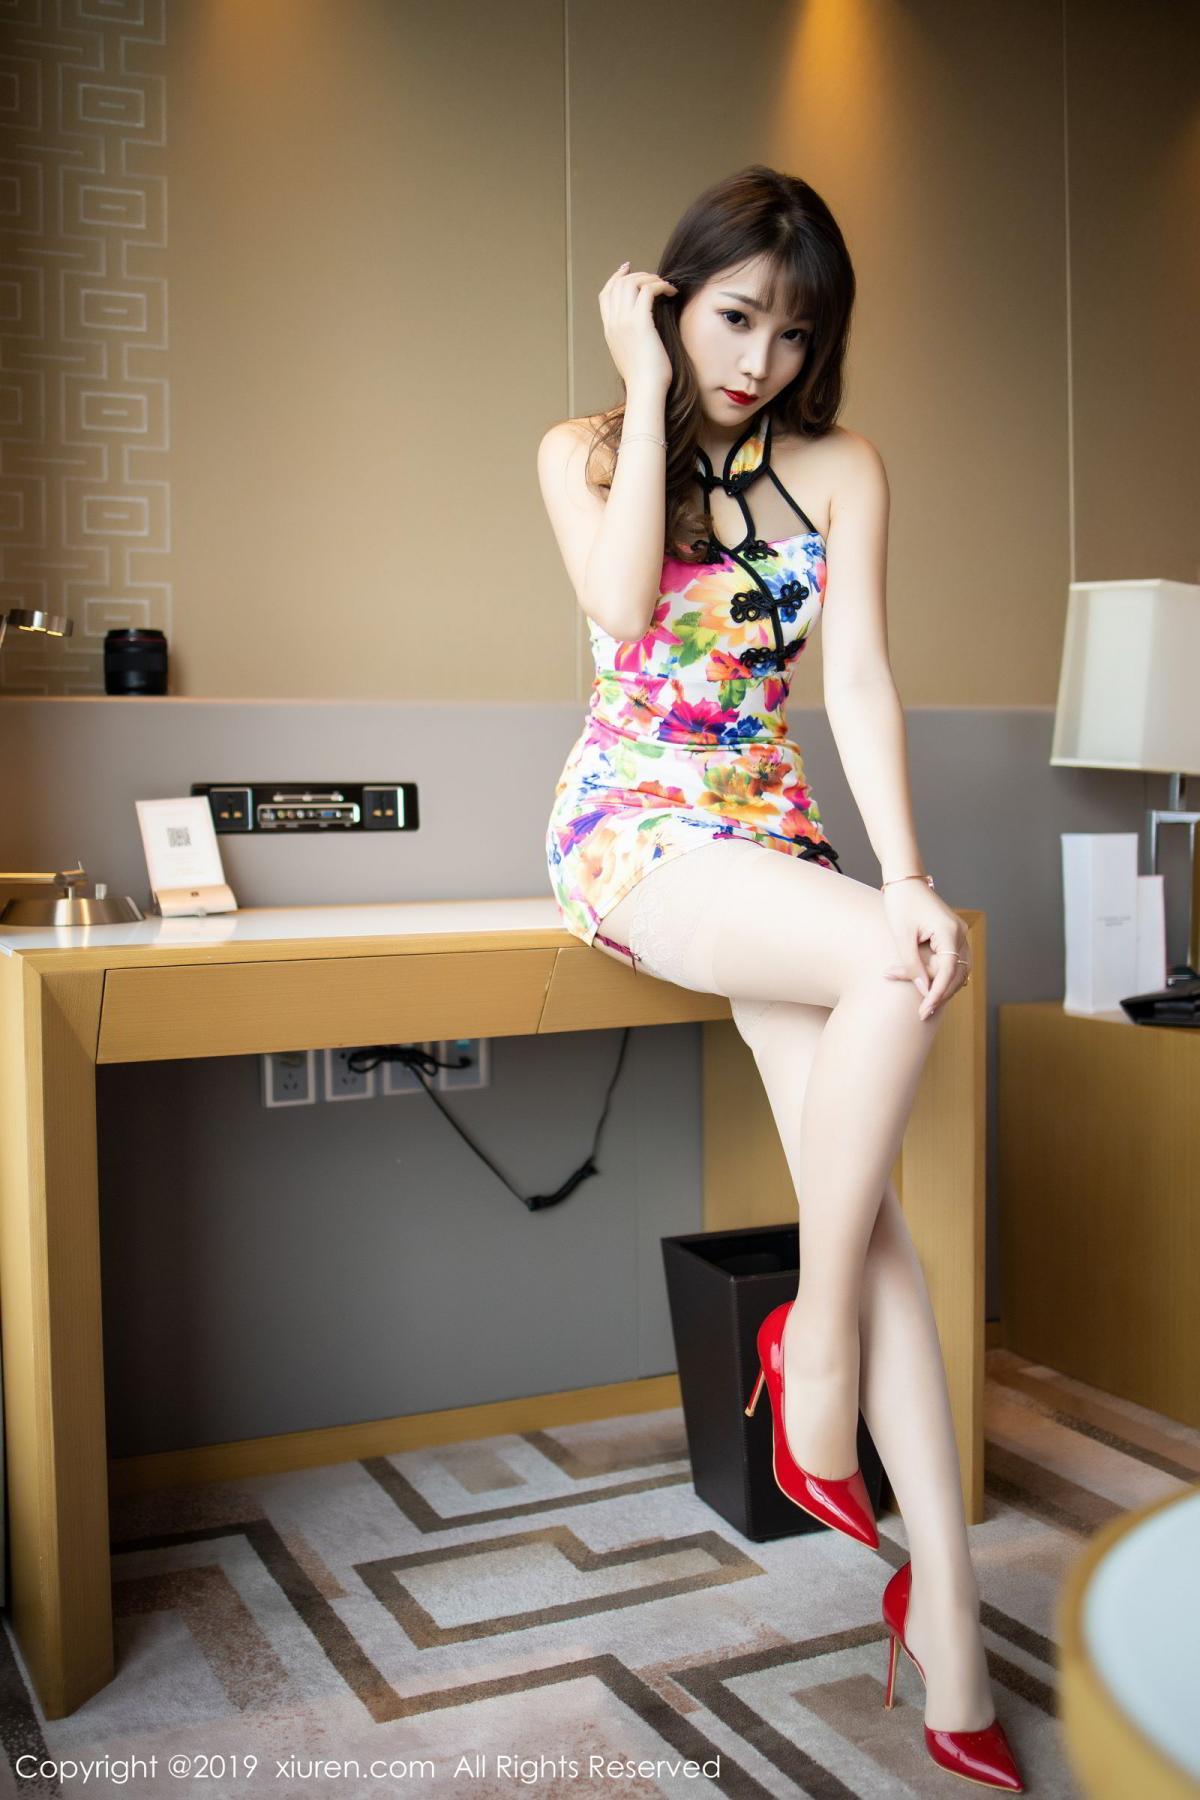 [XiuRen] Vol.1683 Chen Zhi 1P, Chen Zhi, Tall, Underwear, Xiuren